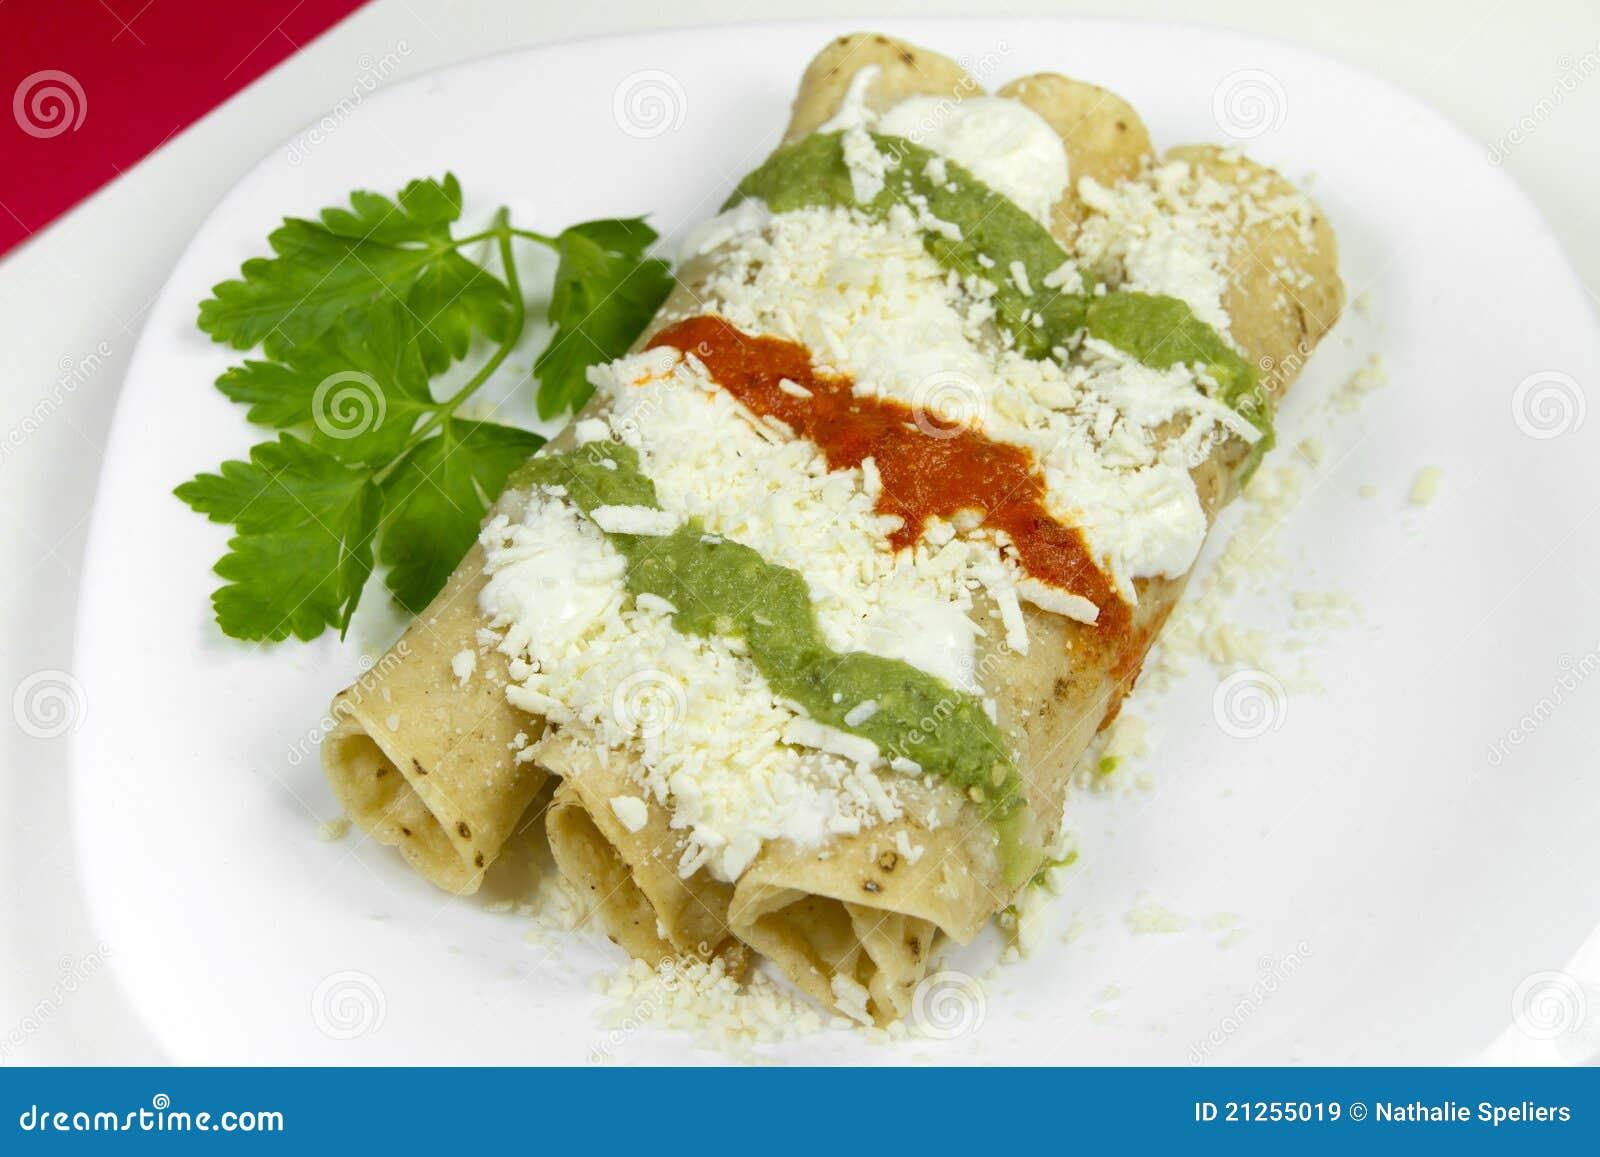 Dorados Image: Tacos Dorados Mexican Dish Royalty Free Stock Images